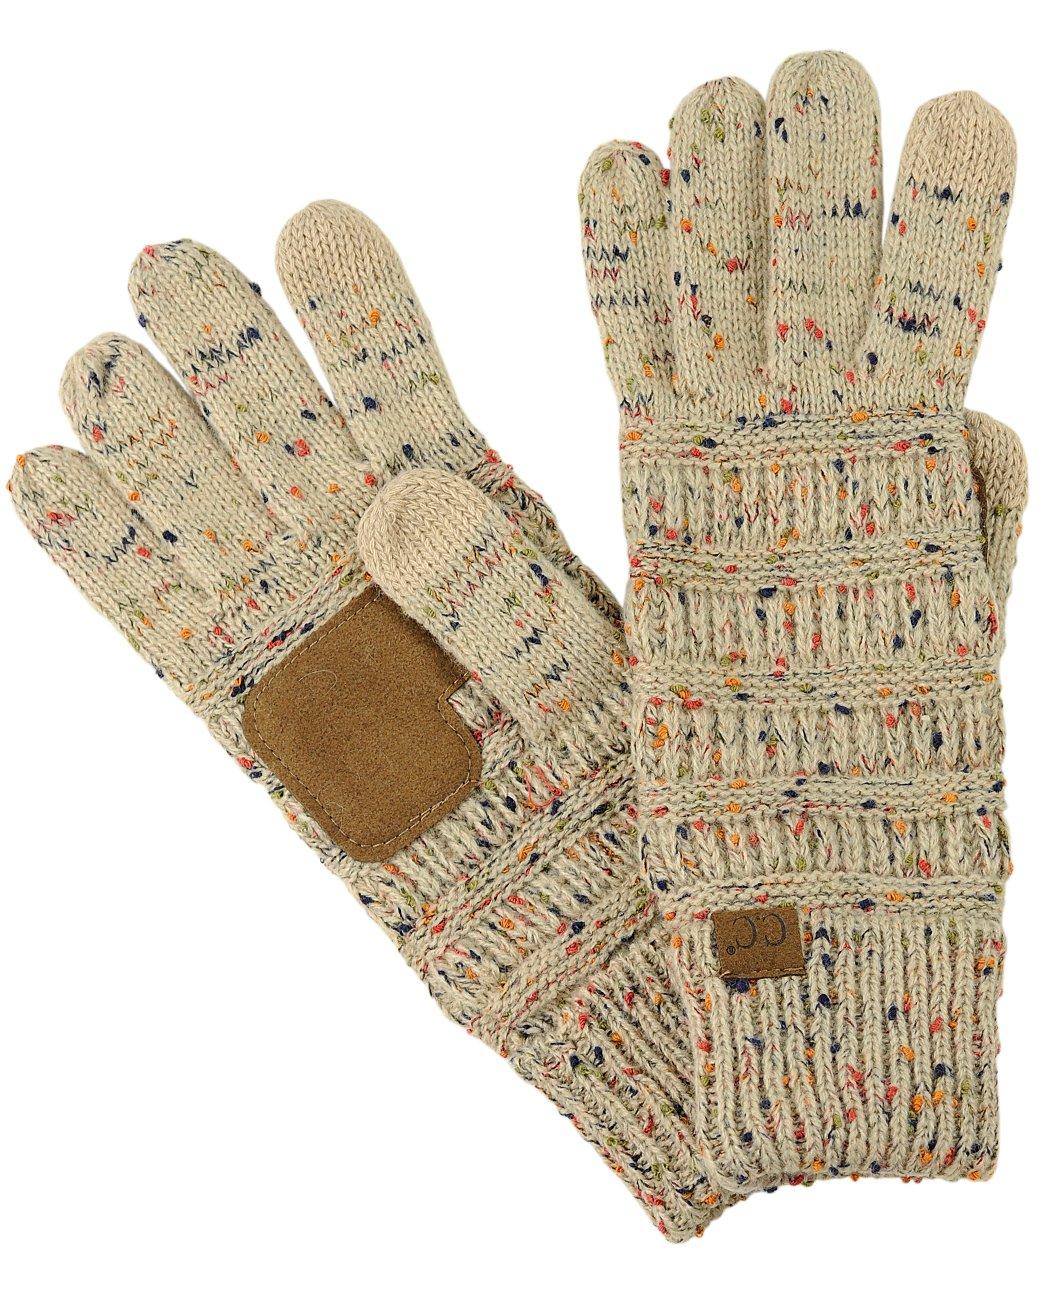 C.C Unisex Cable Knit Winter Warm Anti-Slip Touchscreen Texting Gloves, Confetti Latte